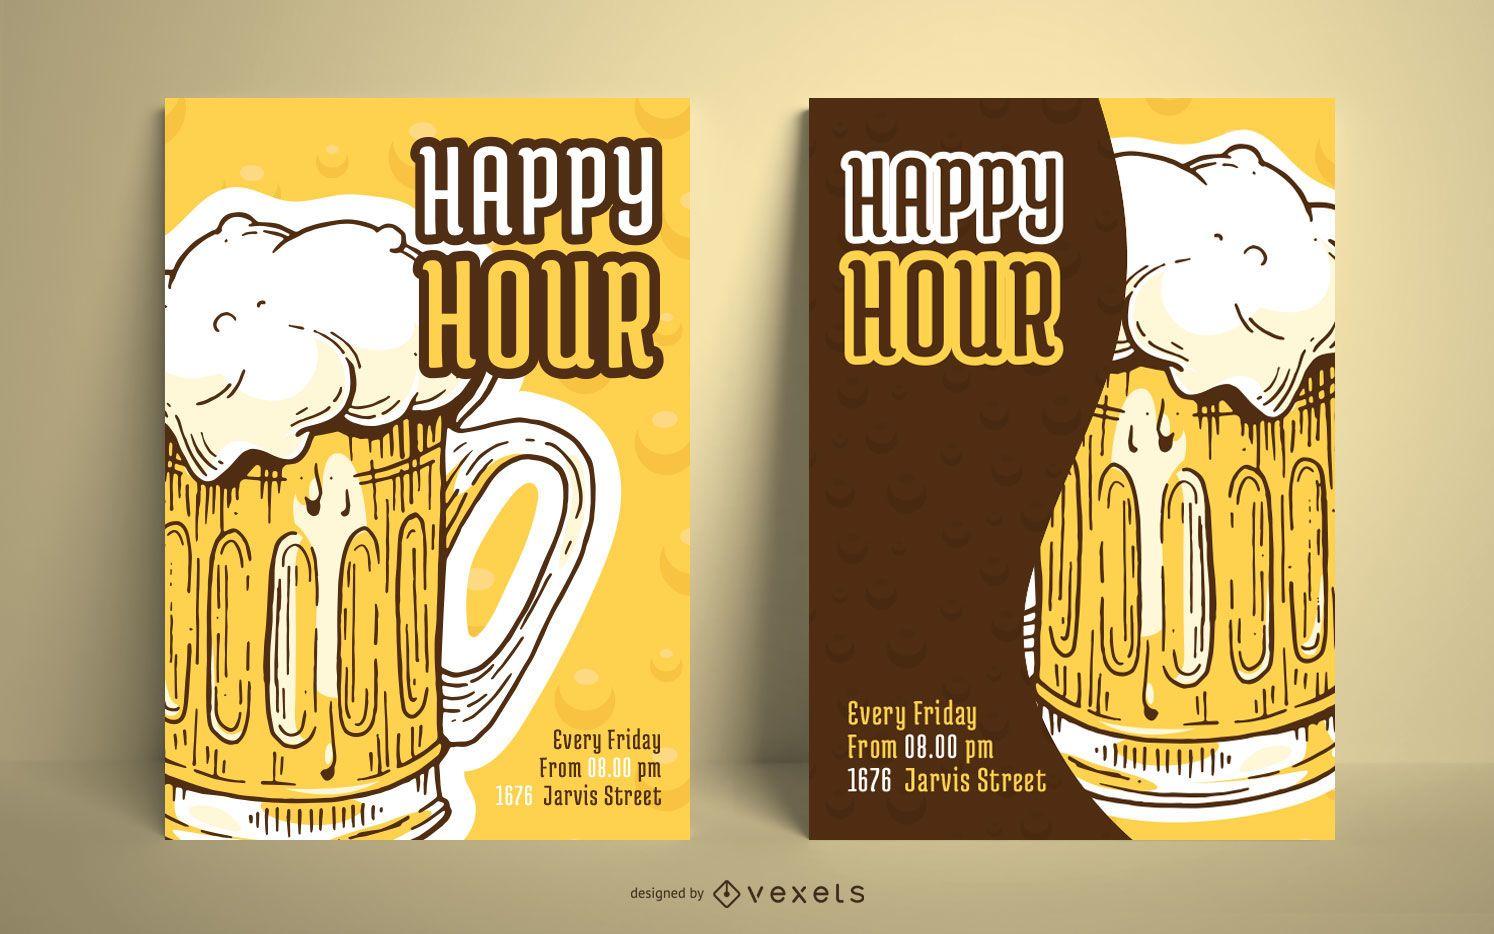 Illustrated Beer Poster Design Pack